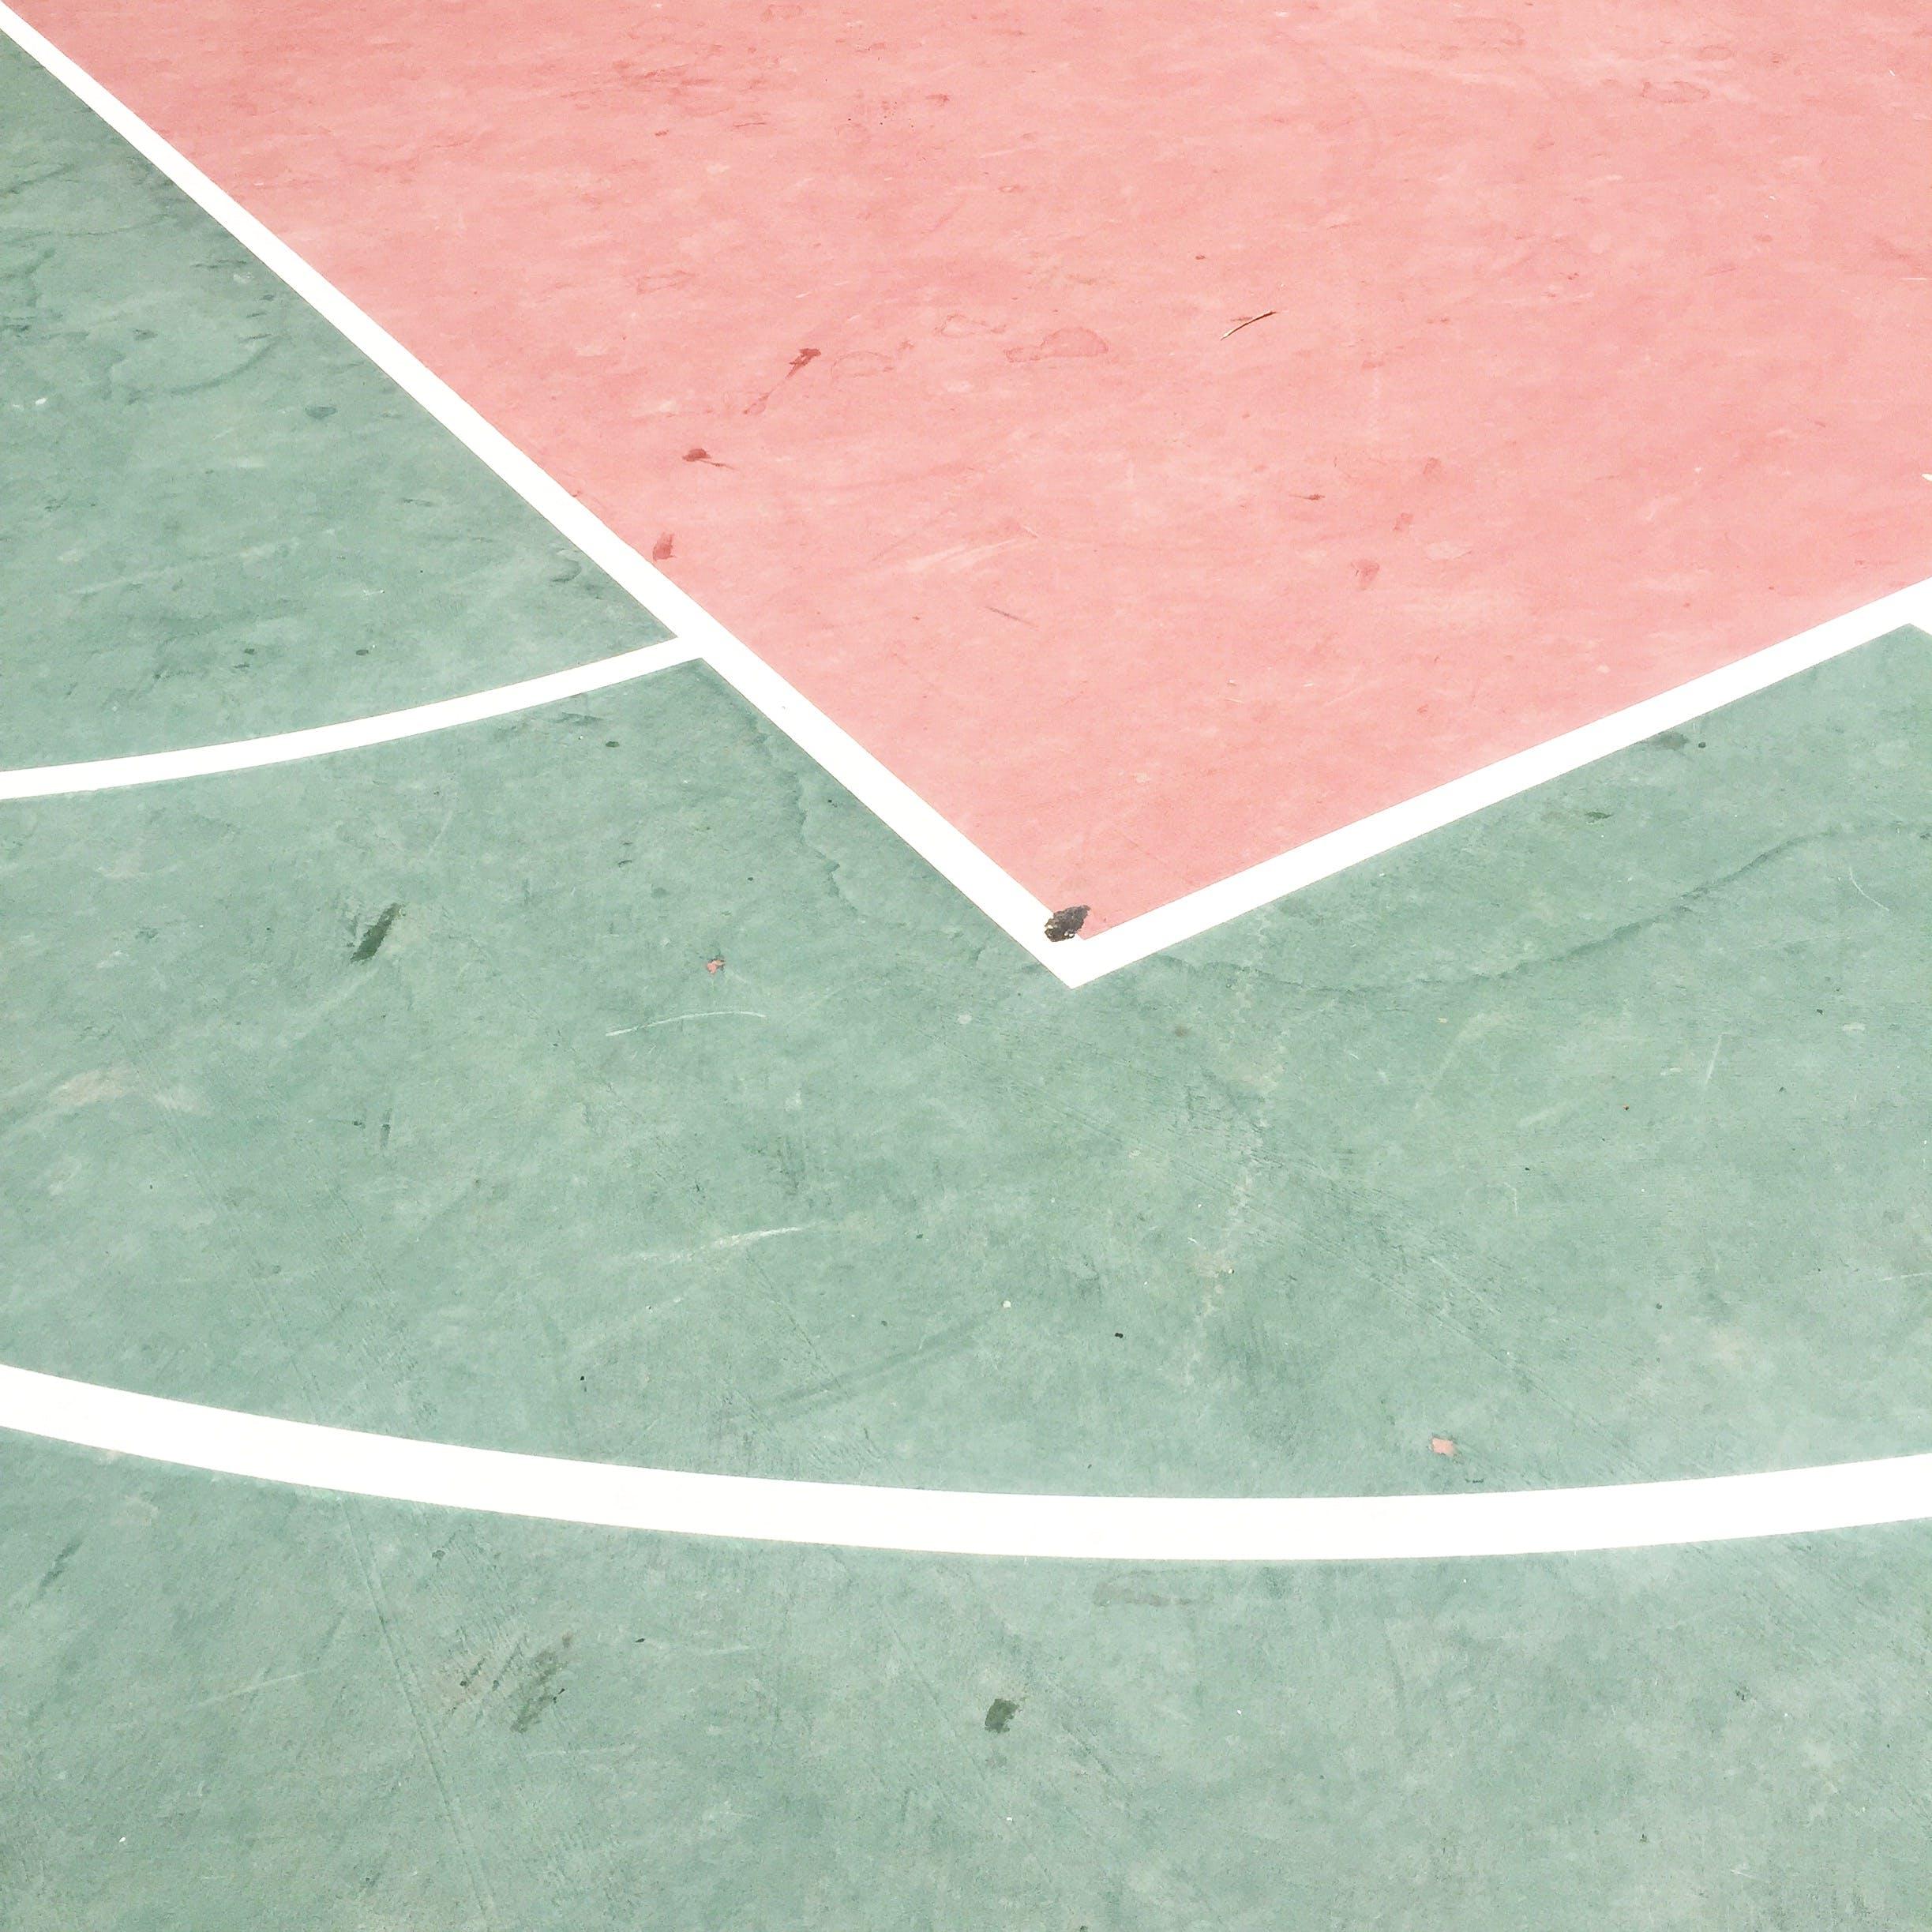 Kostenloses Stock Foto zu boden, gericht, tennis, tennis ball